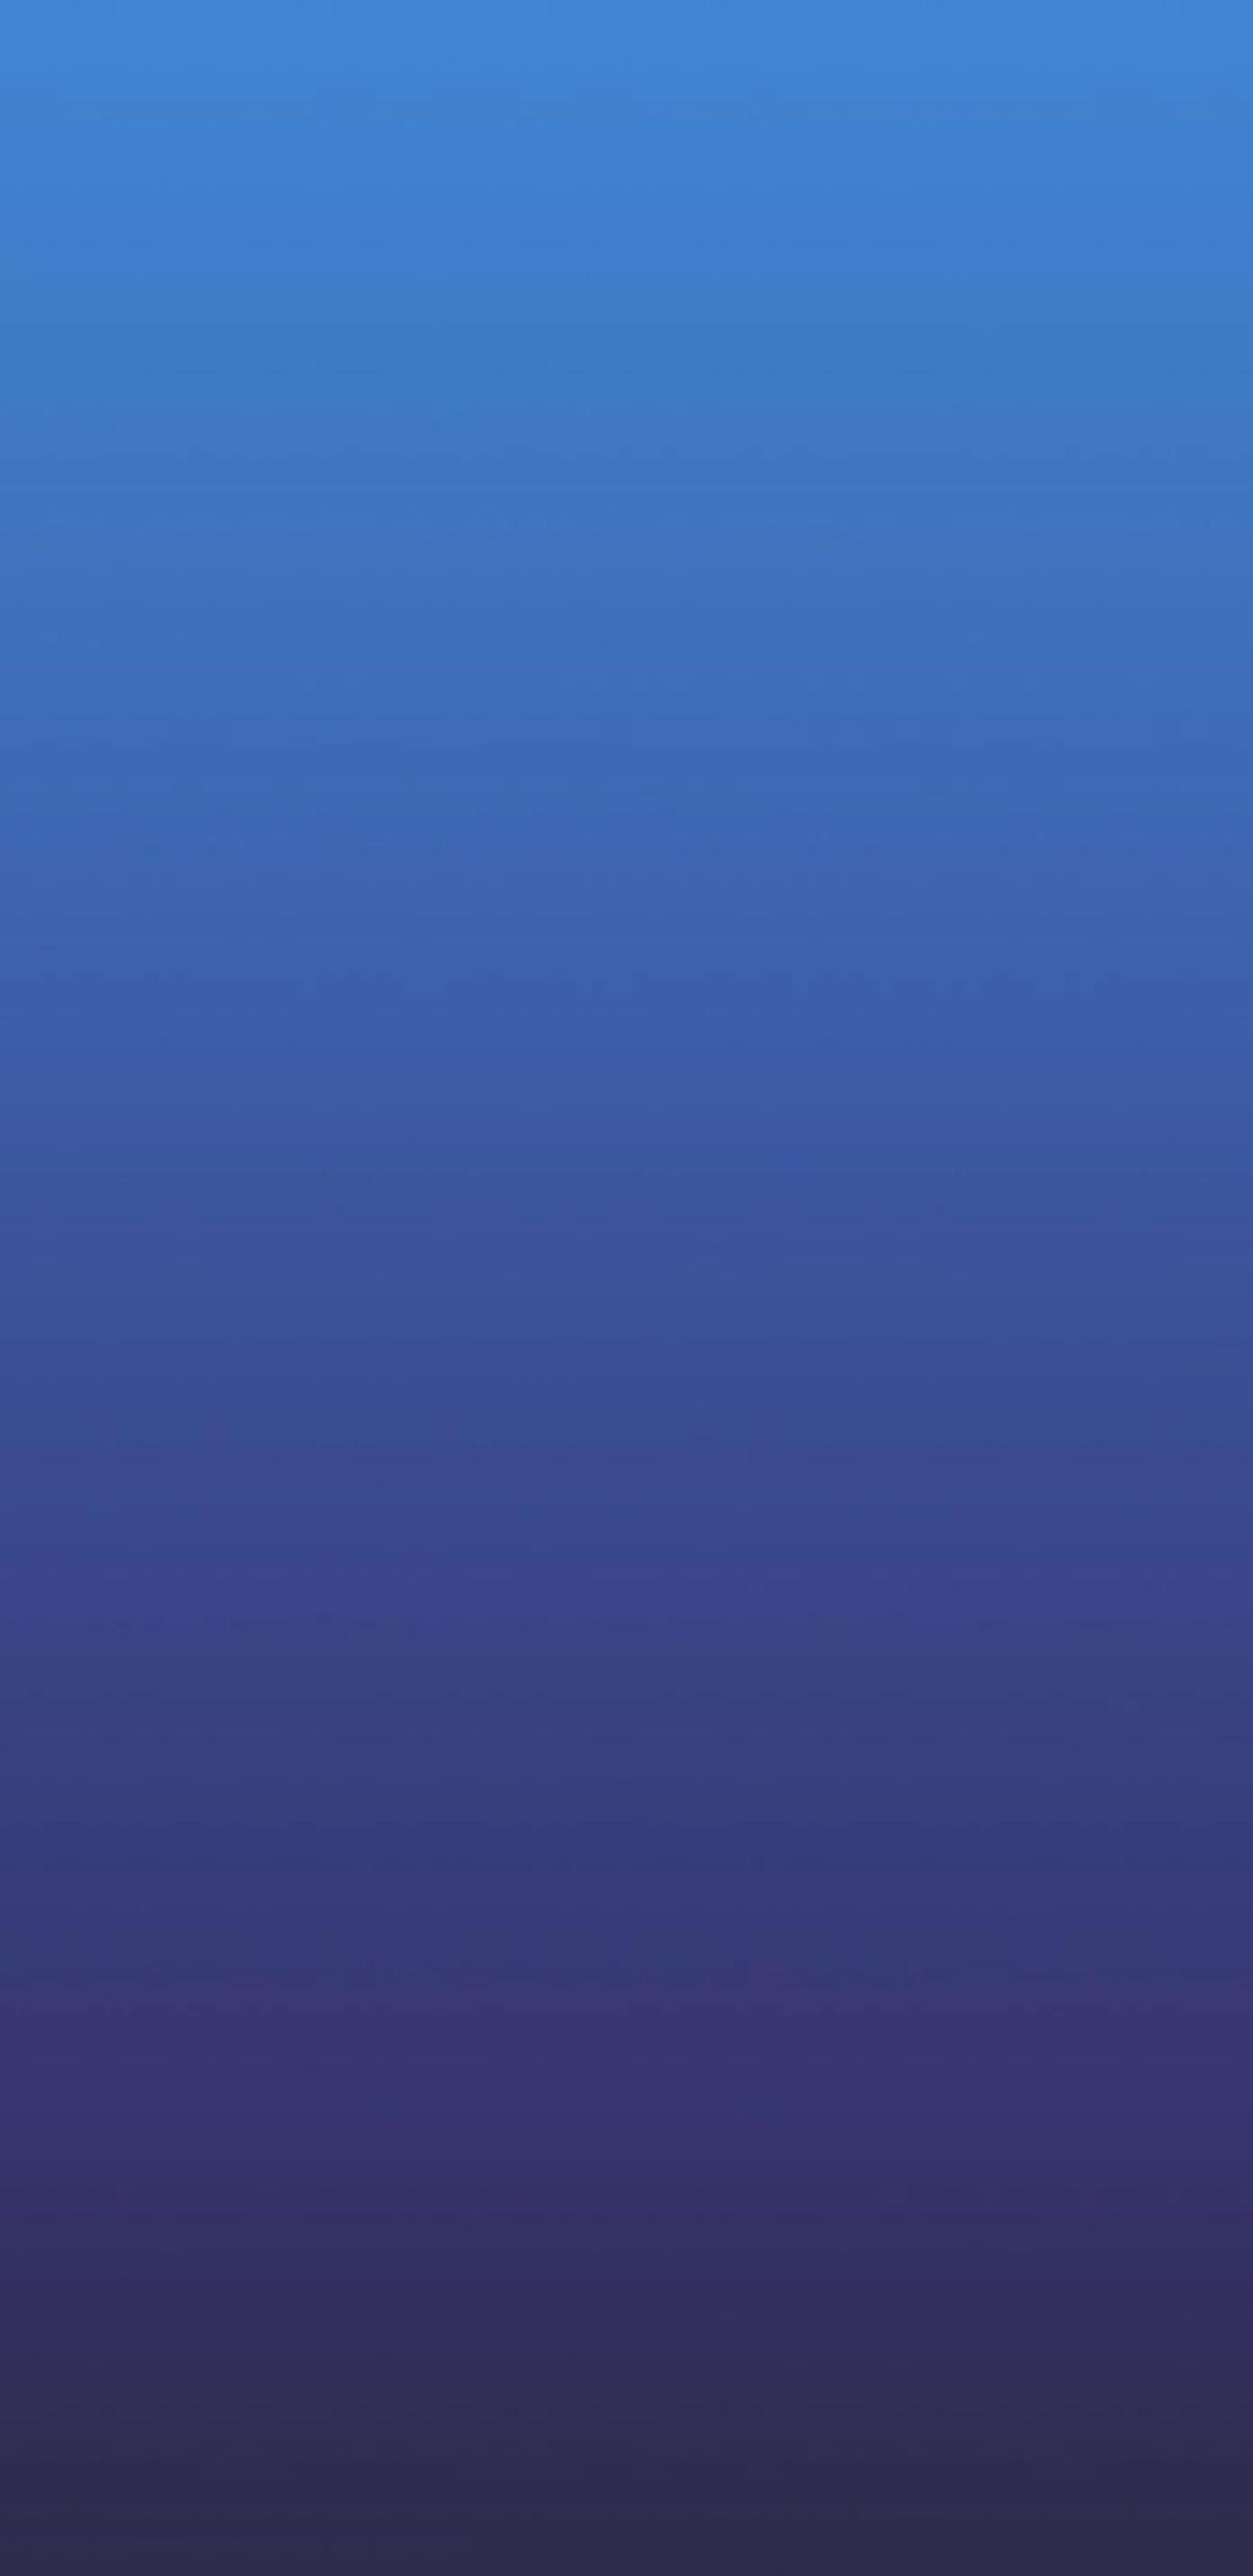 Samsung Galaxy S8 Wallpaper Background Colour 1440x2961 Wallpaper Teahub Io